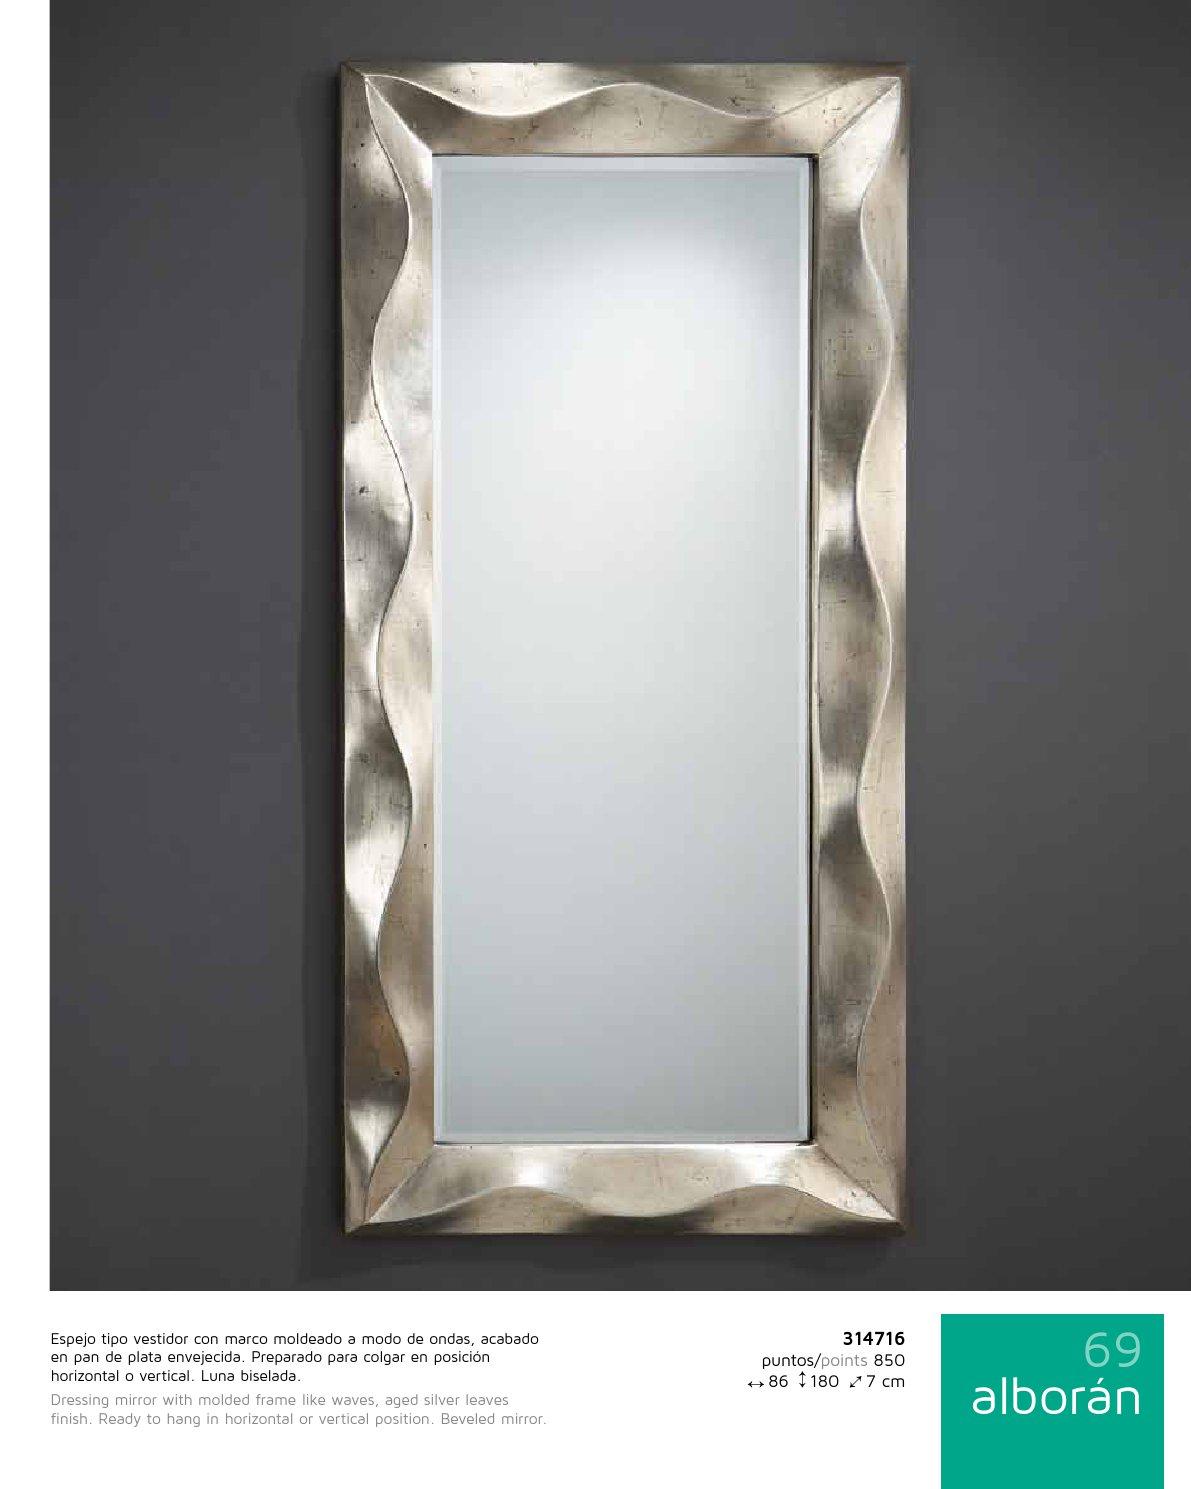 Schuller alboran miroir rectangulaire cadre 314716 for Schuller miroir